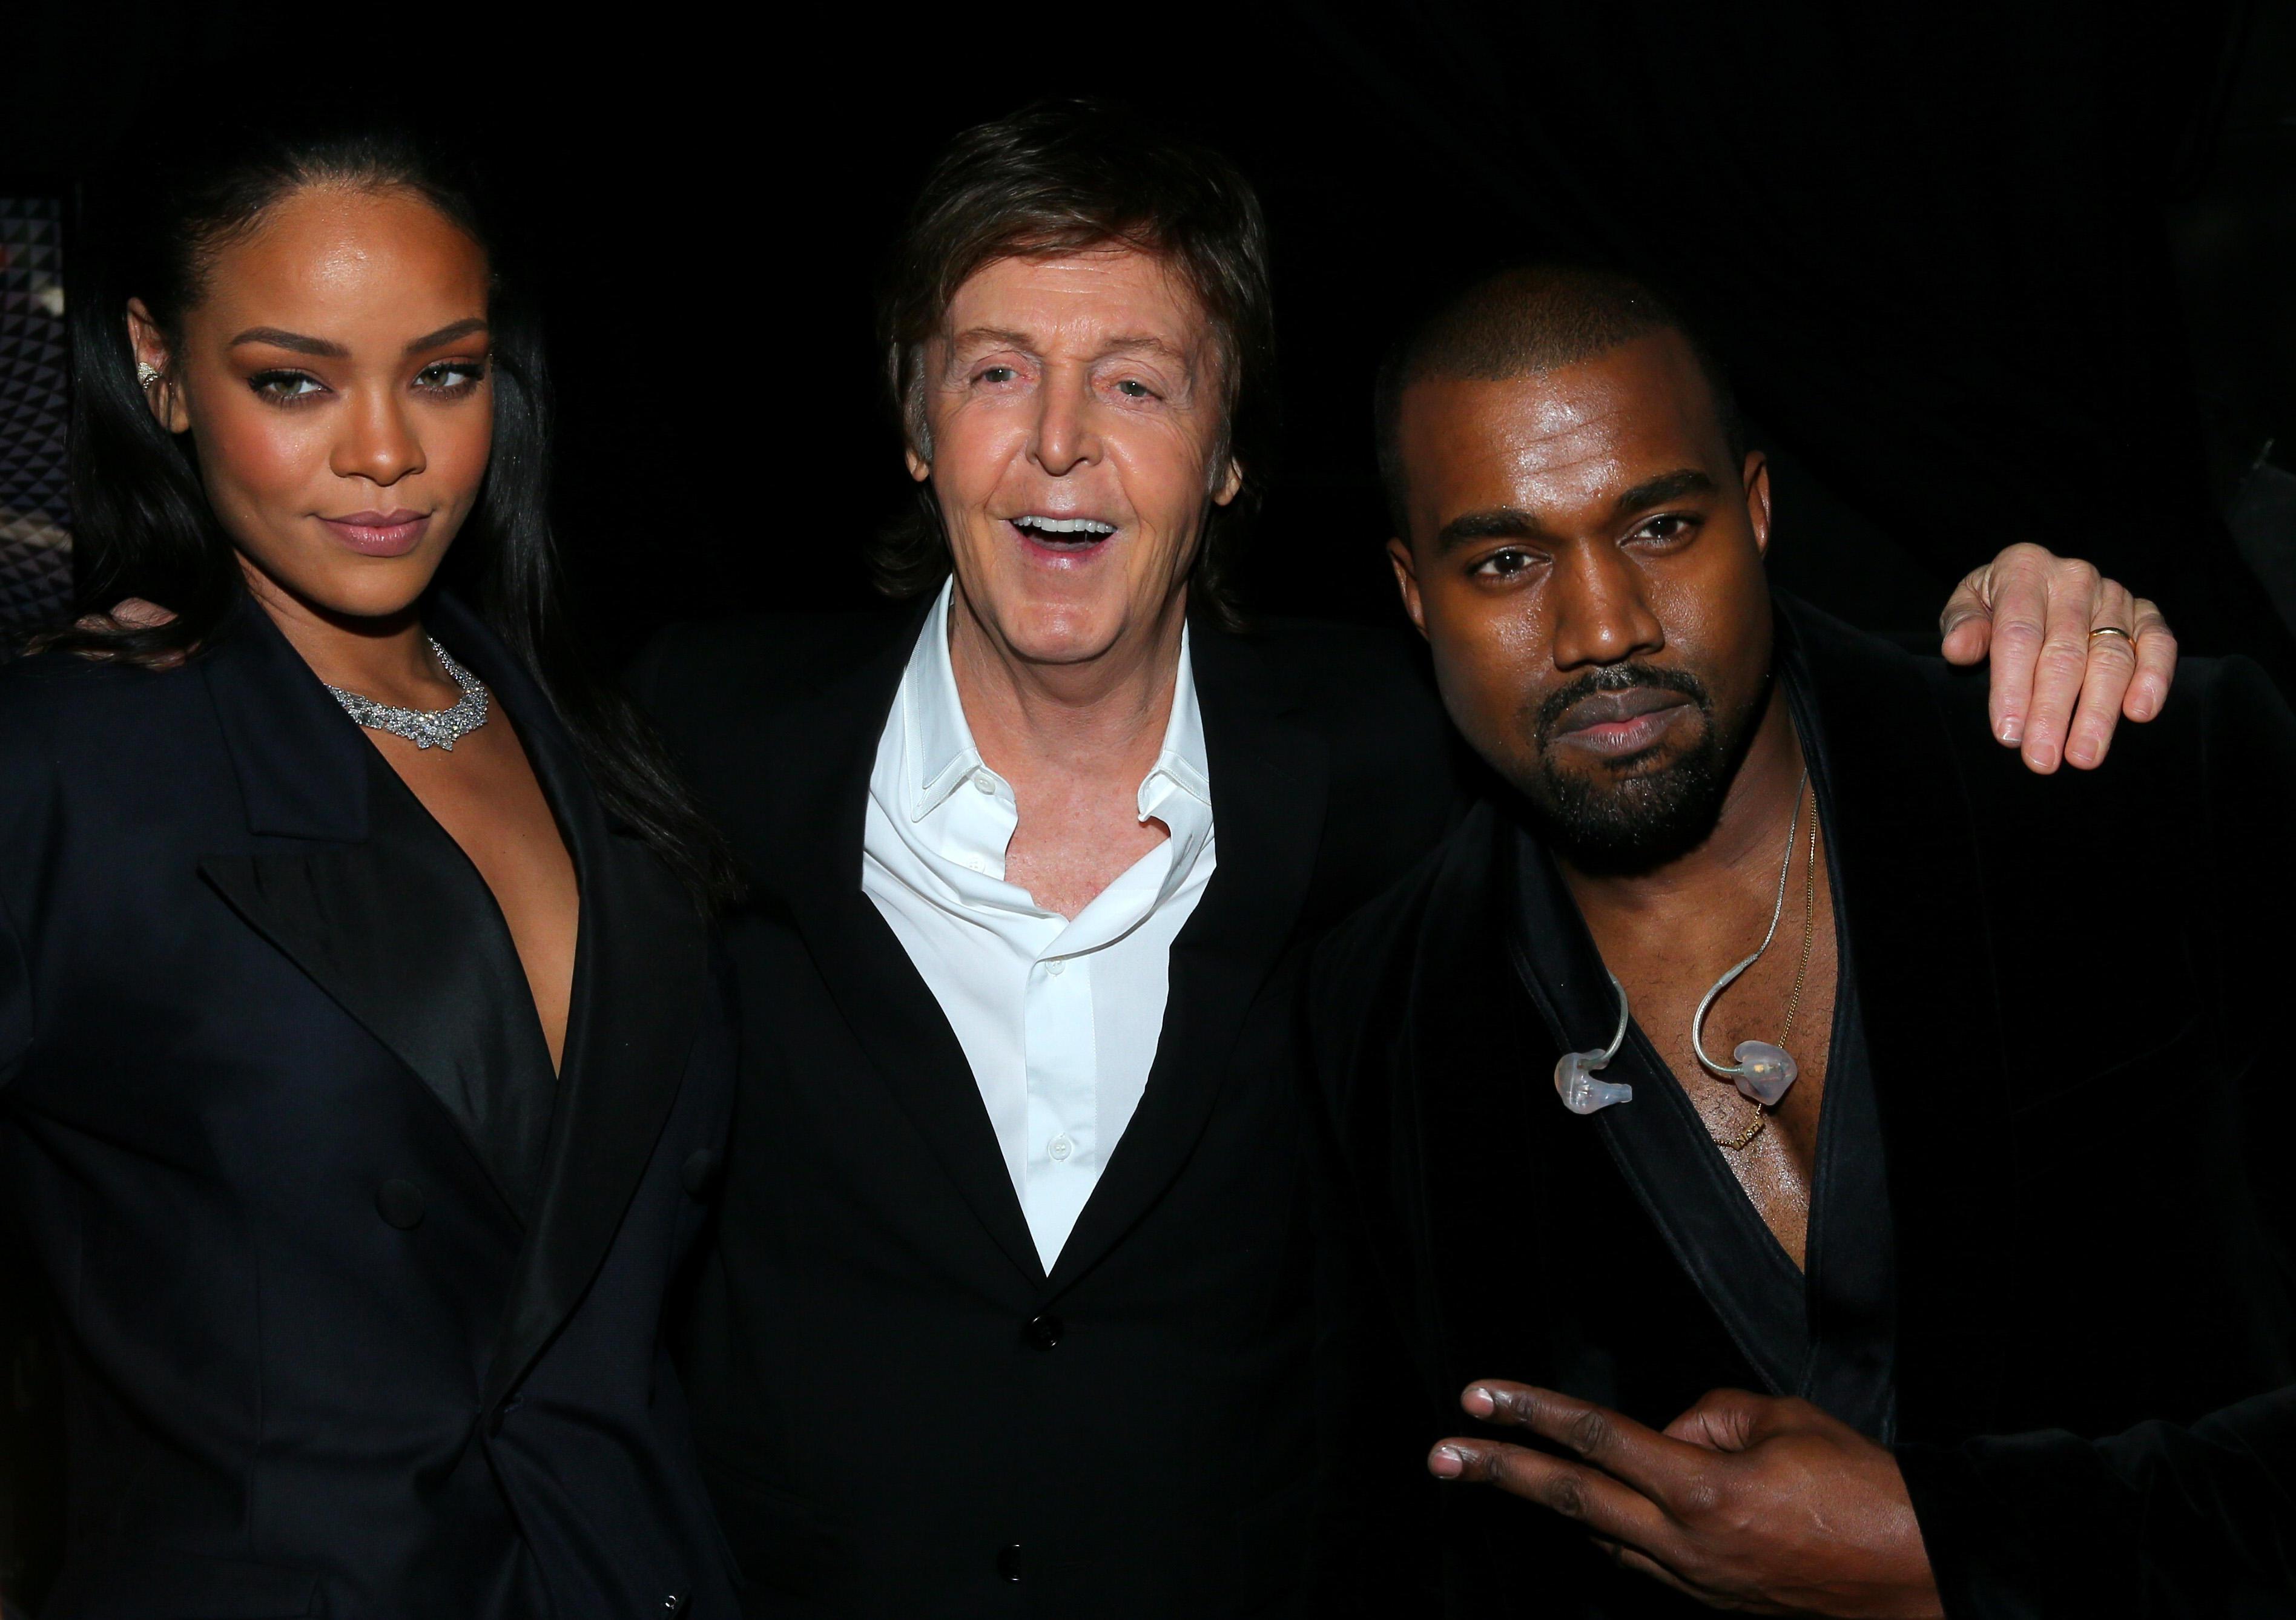 The 57th Annual GRAMMY Awards - Backstage - Rihanna, Kanye West, Paul McCartney